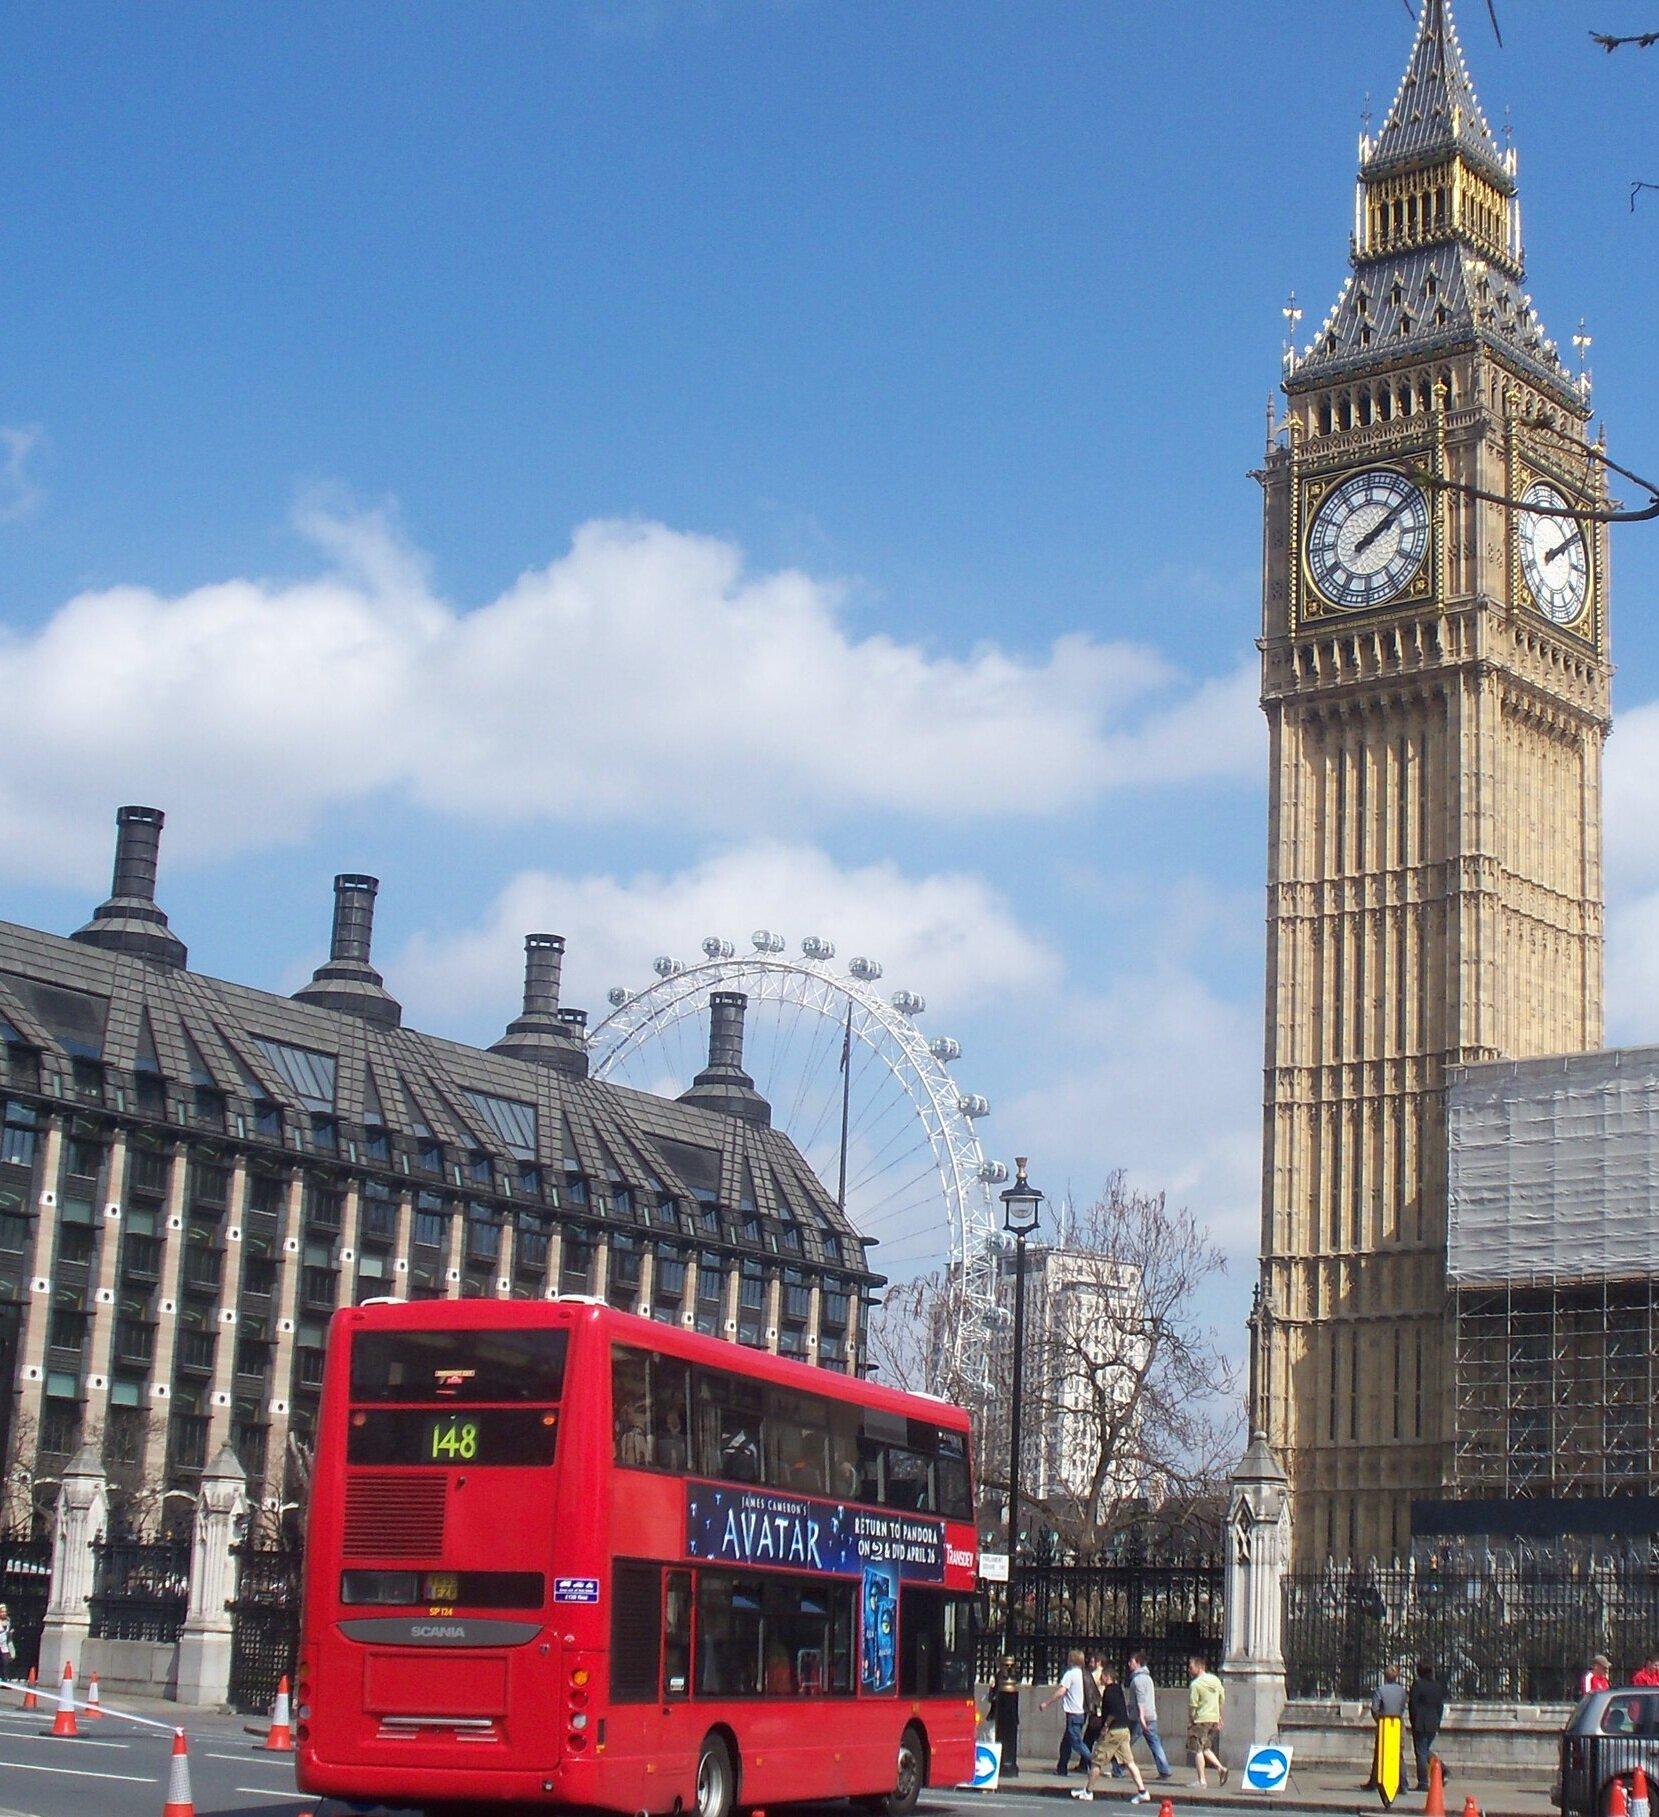 Big Ben and double-decker bus in London.